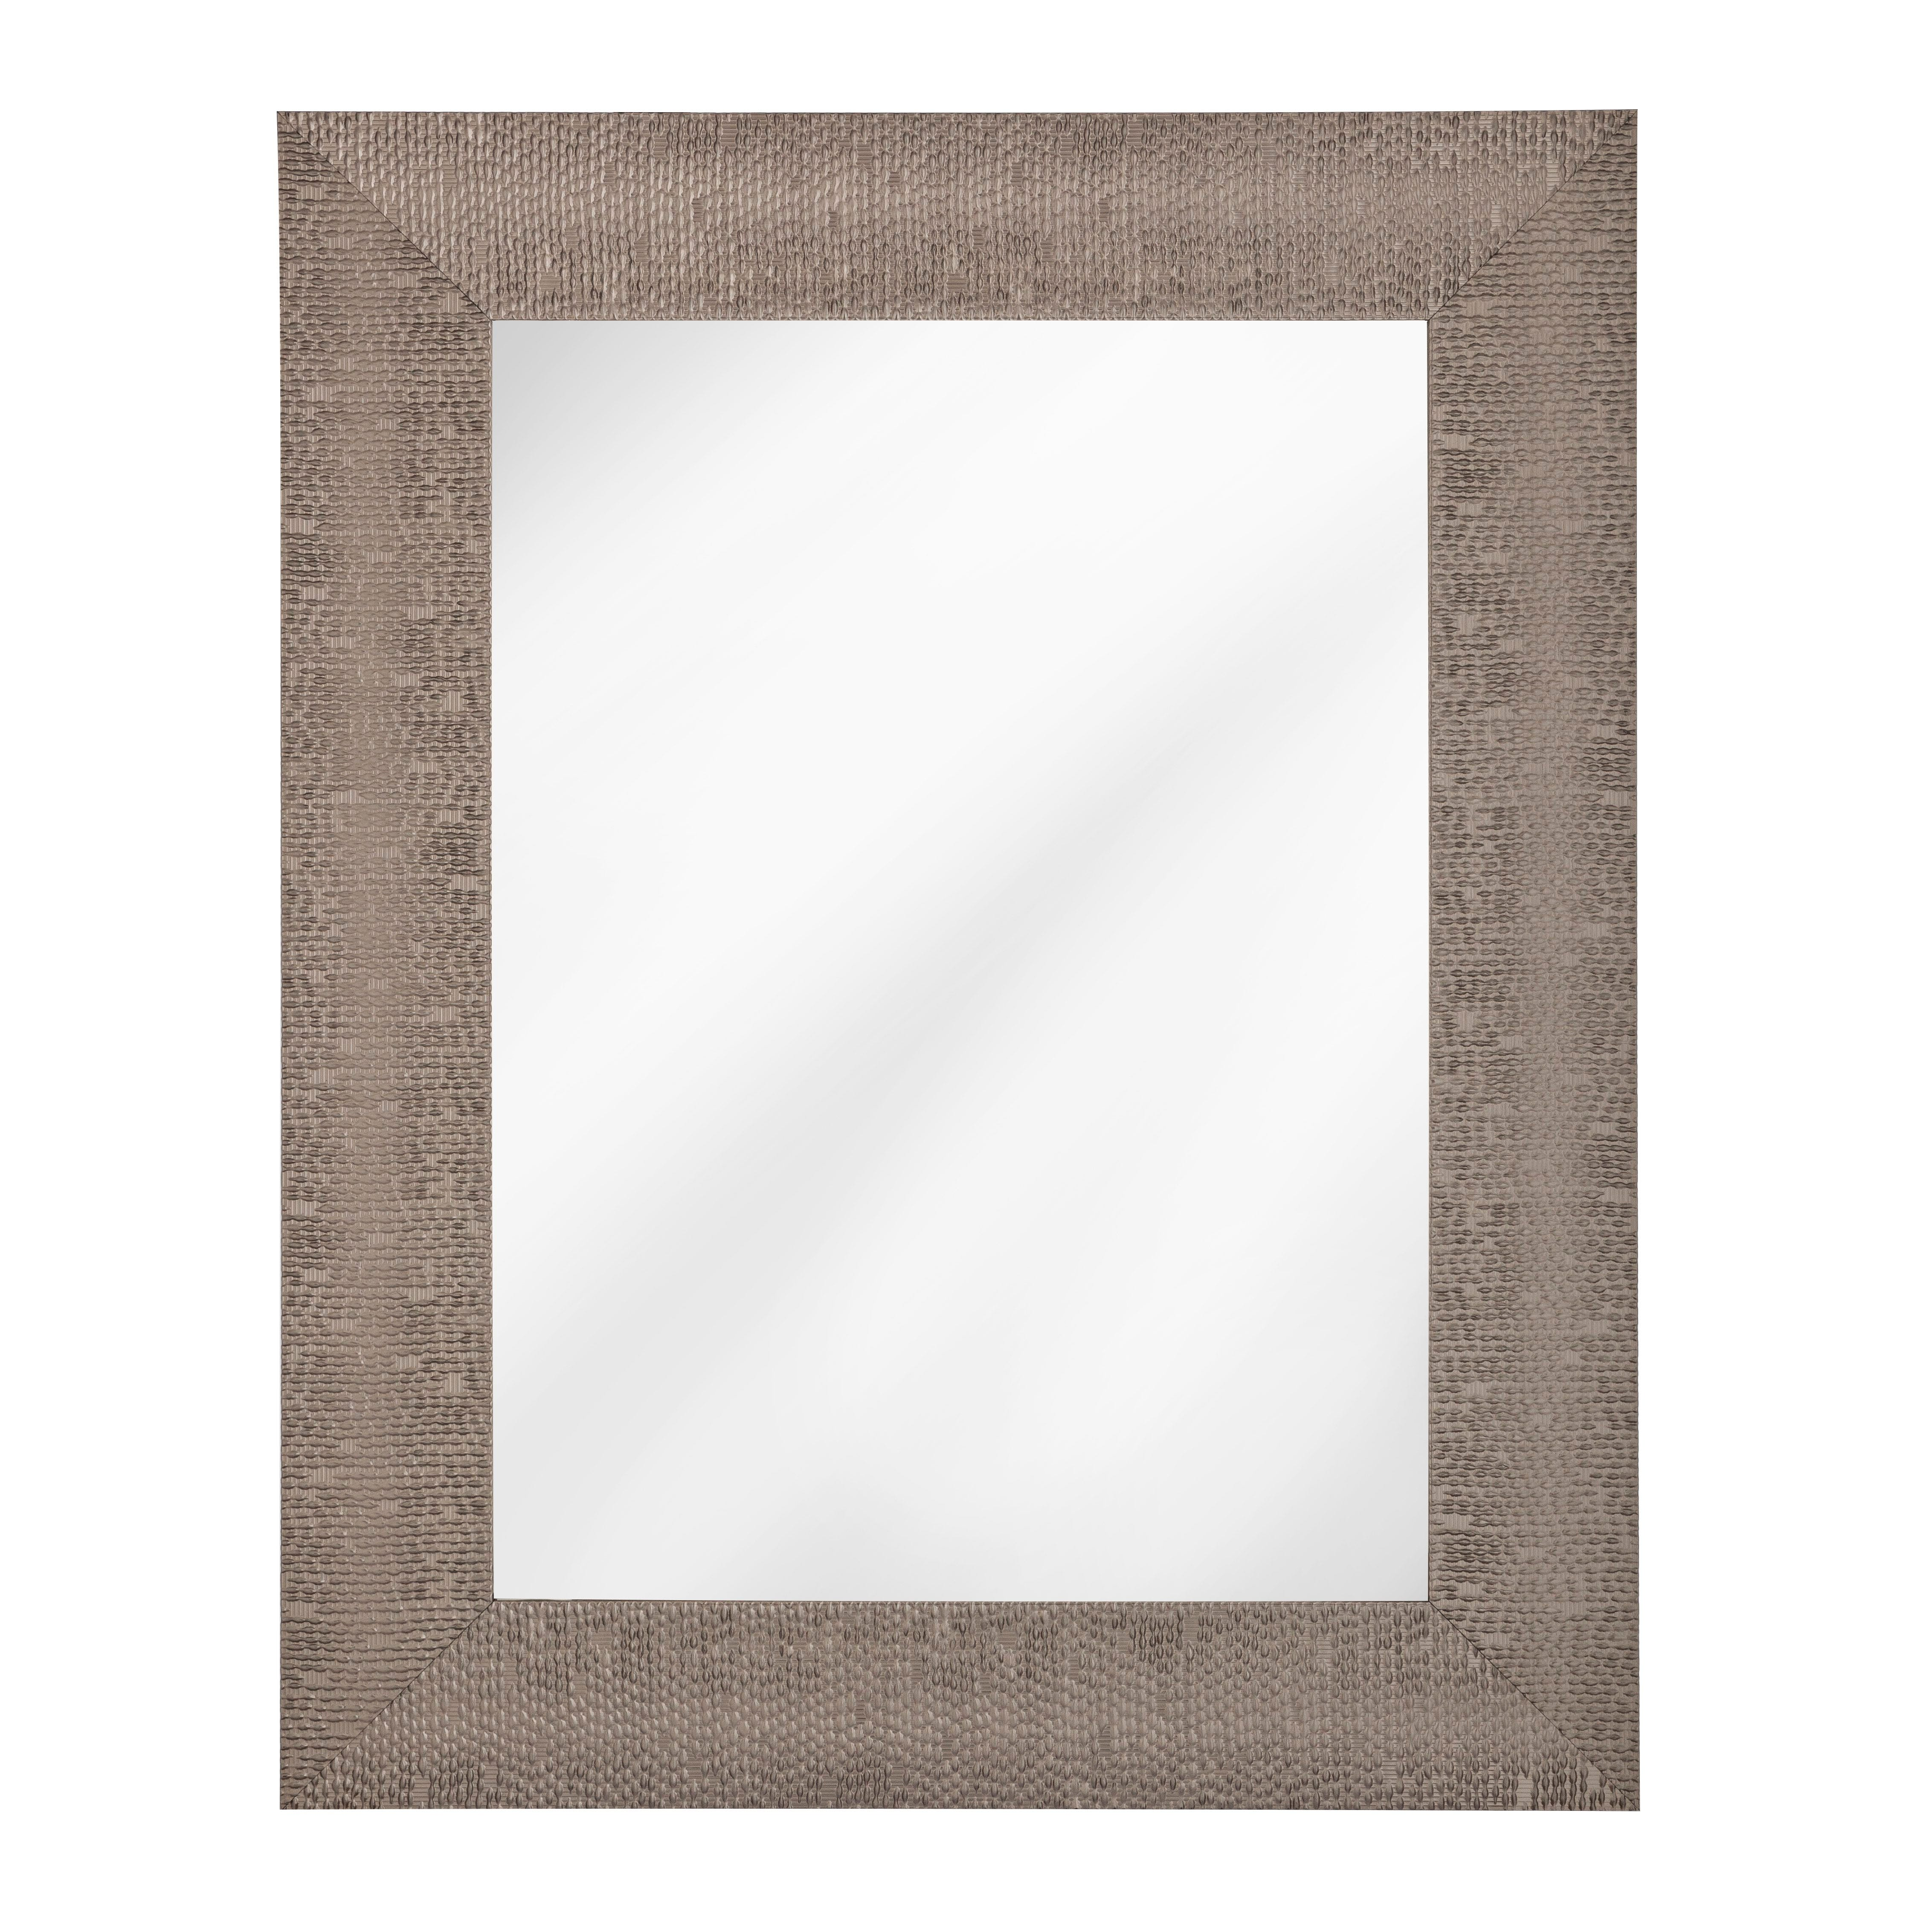 Espejo decorativo de 78.68 x 62 cm en plata